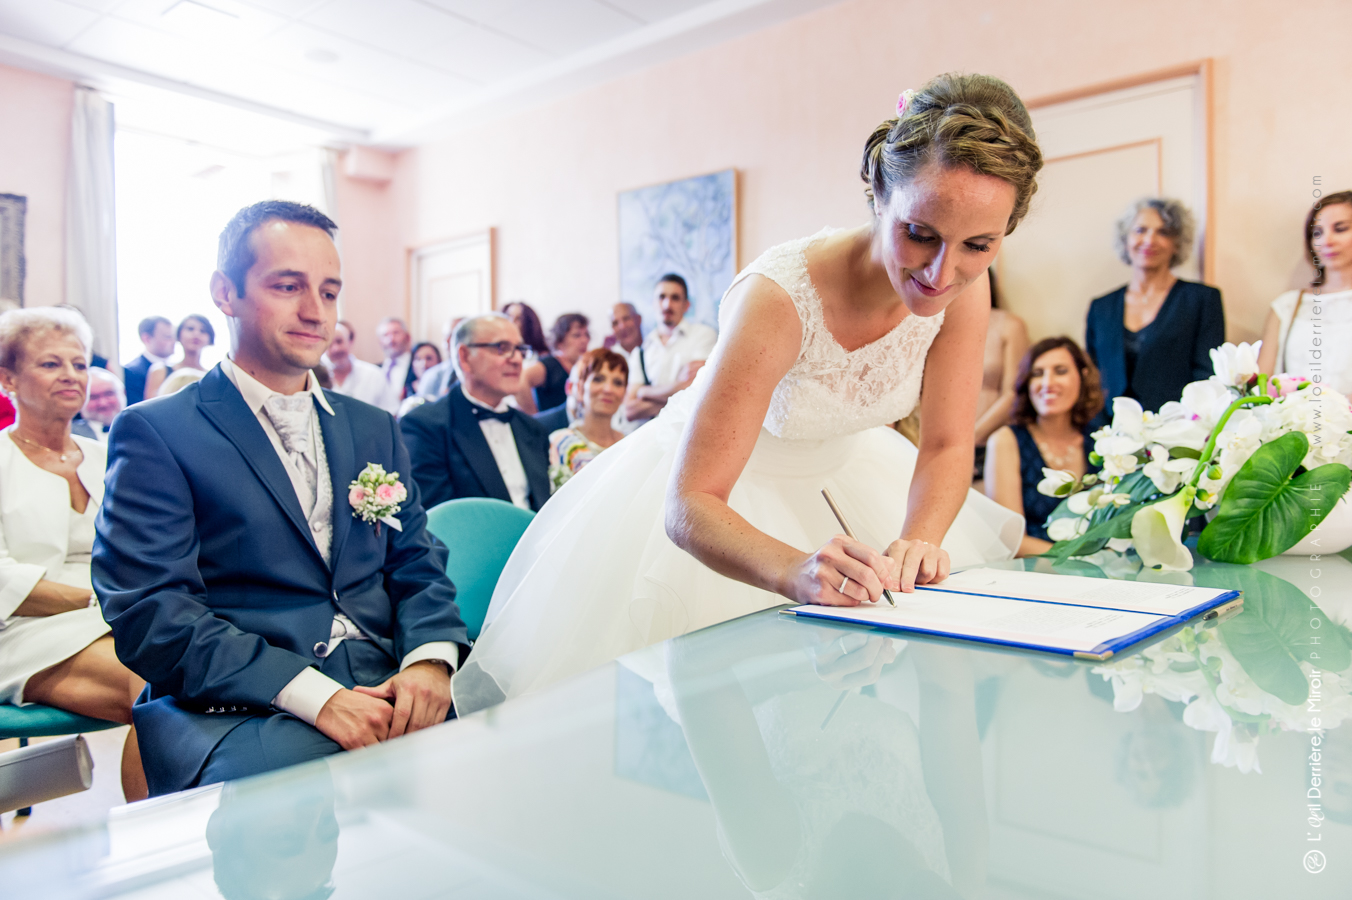 mariage-cj-vaugrenier-loeilderrierelemiroir-031